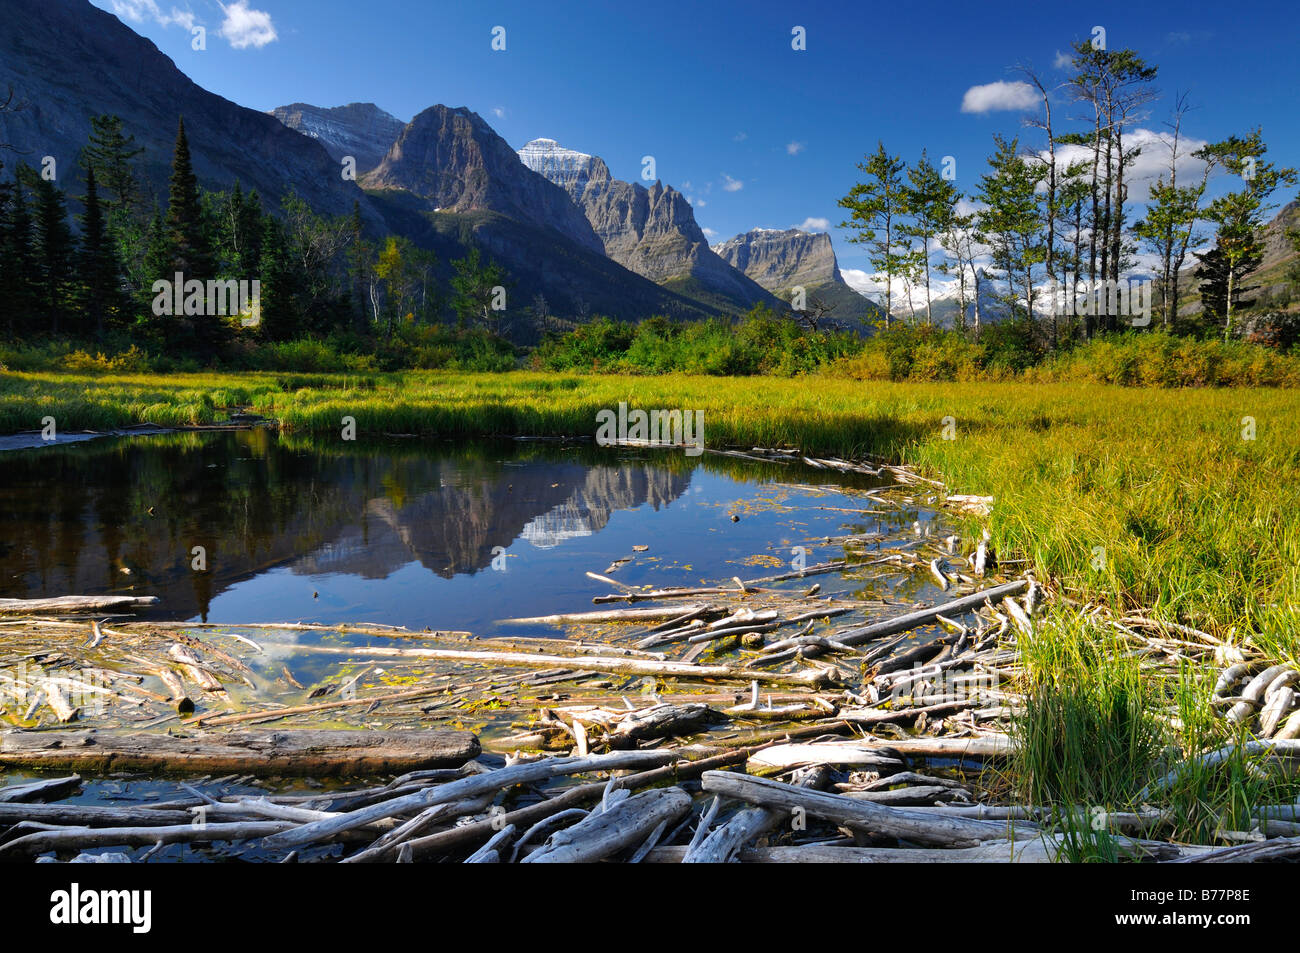 Driftwood on Lake Saint Mary, Glacier National Park, Montana, USA, North America Stock Photo